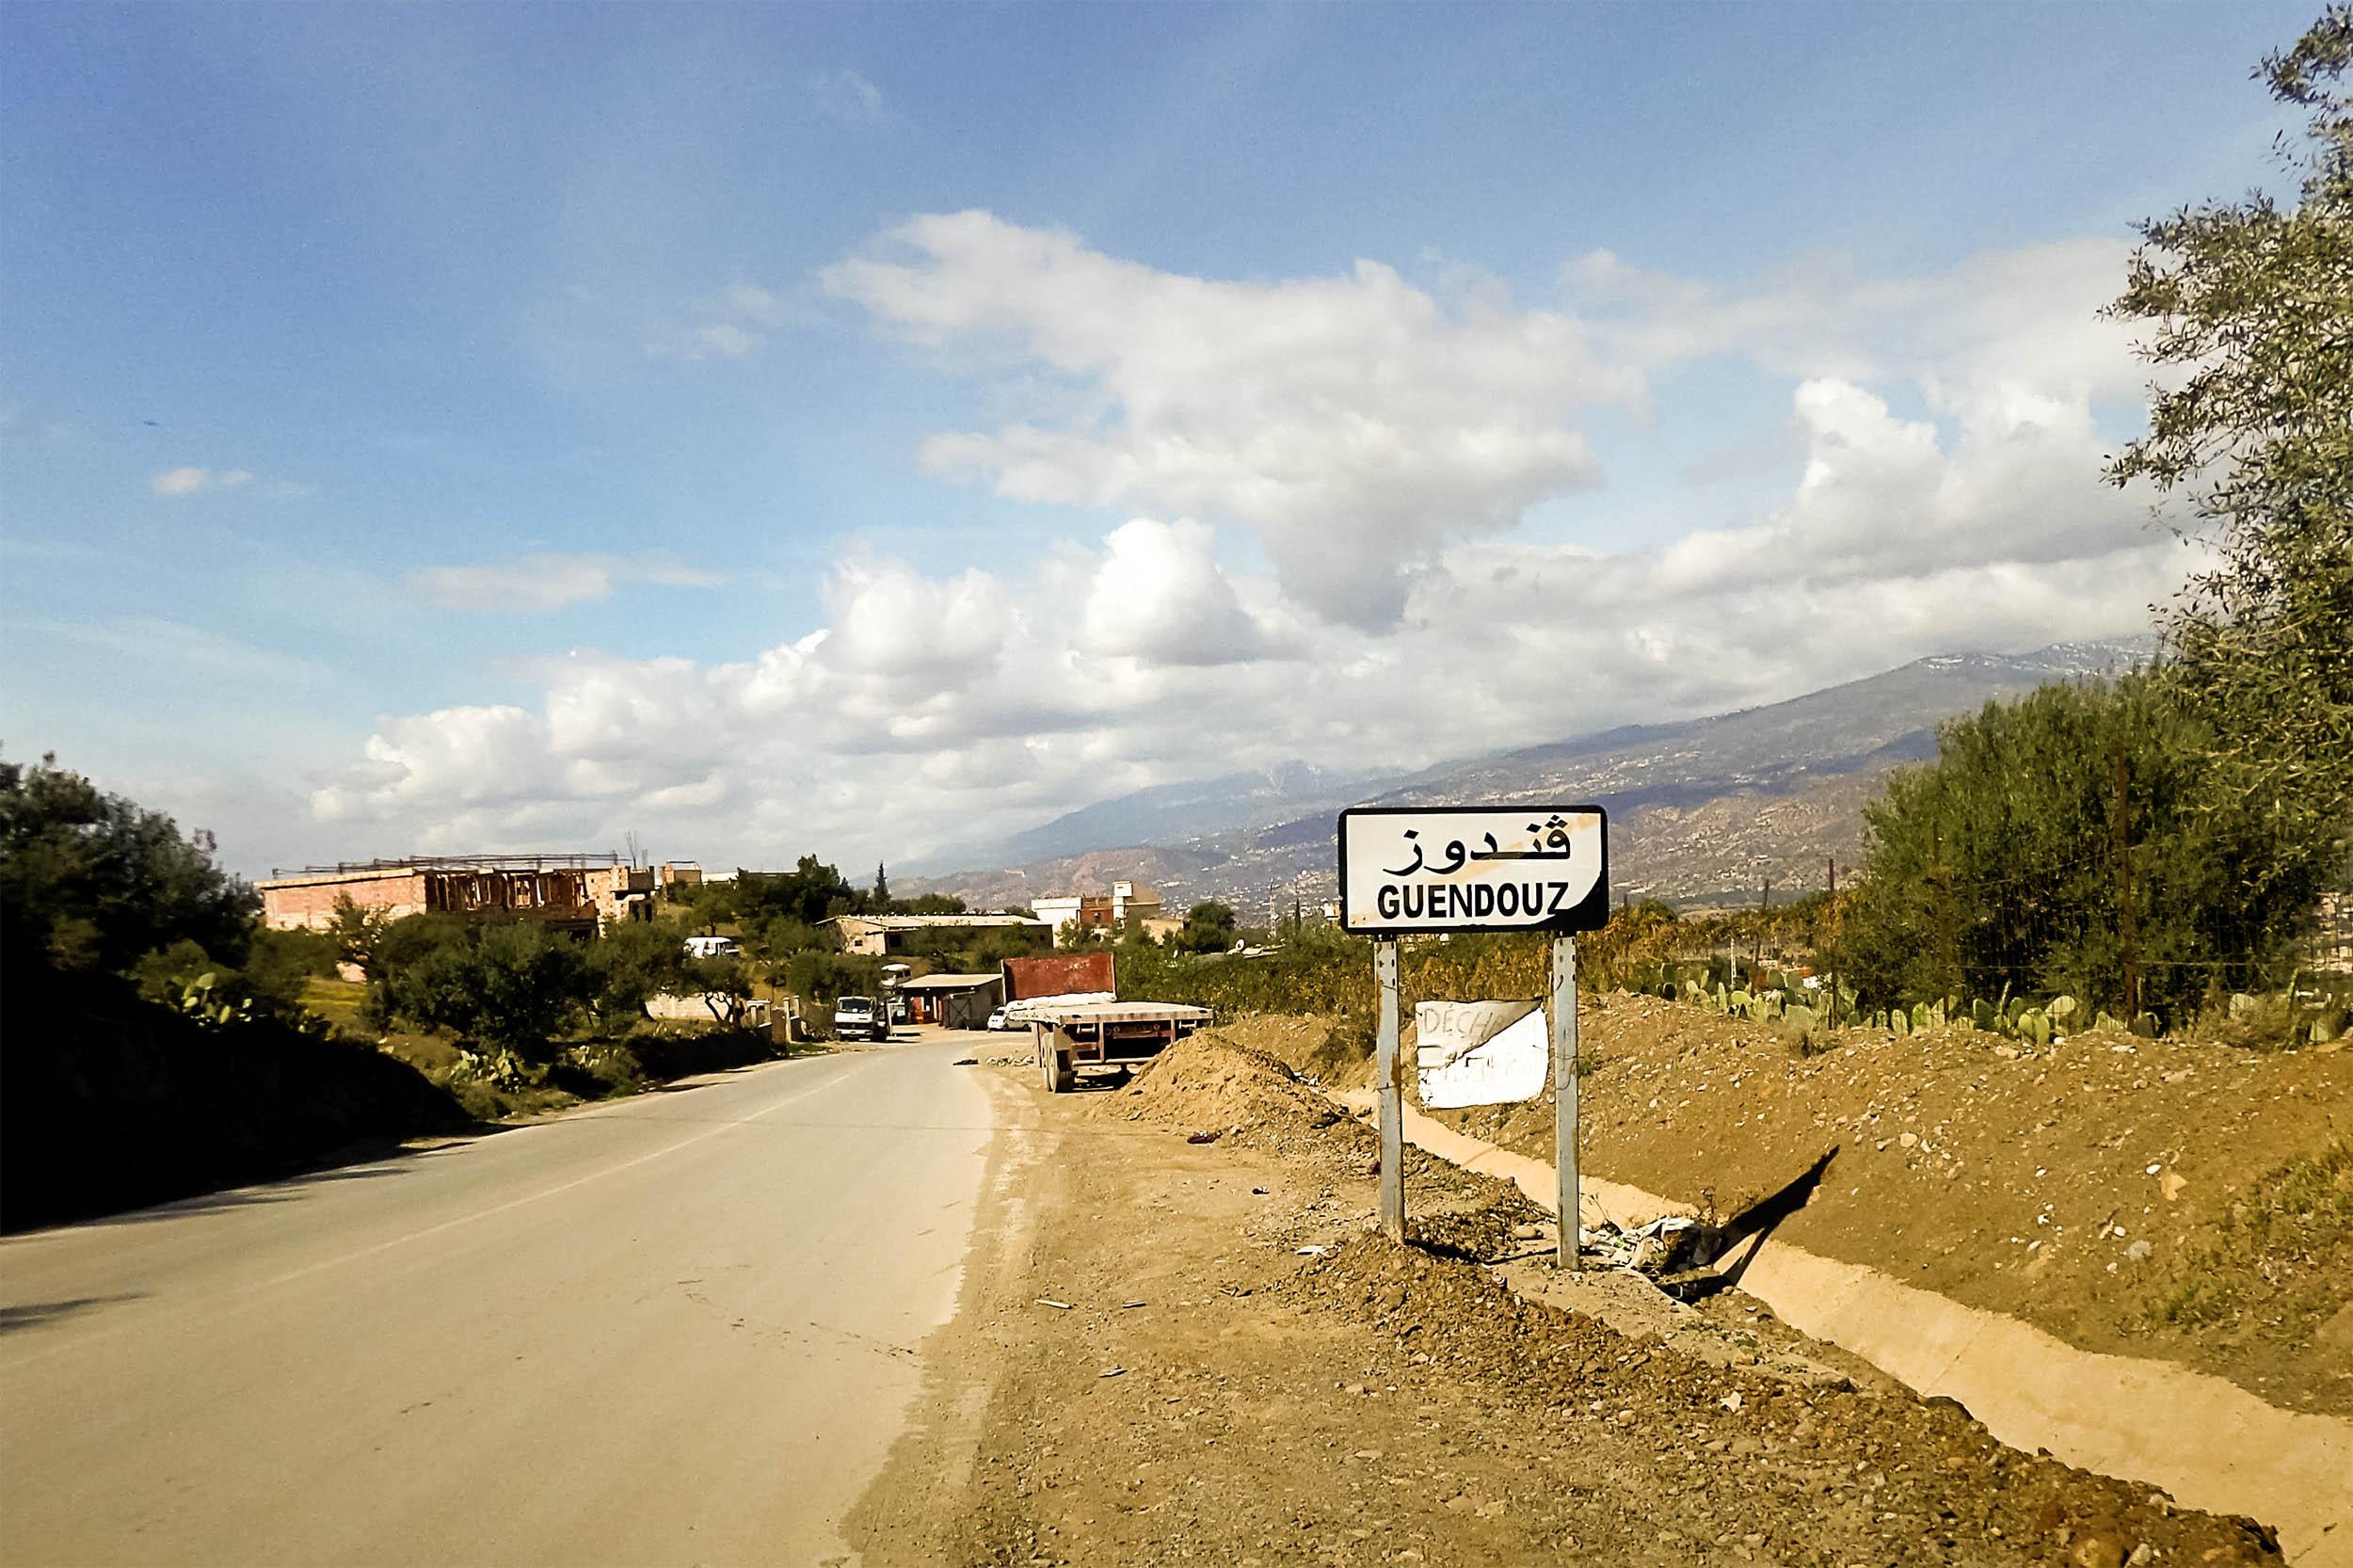 Guendouz قندوز - أثناء مفاوضات السلام ..هجوم طالبان على مدينة قندوز